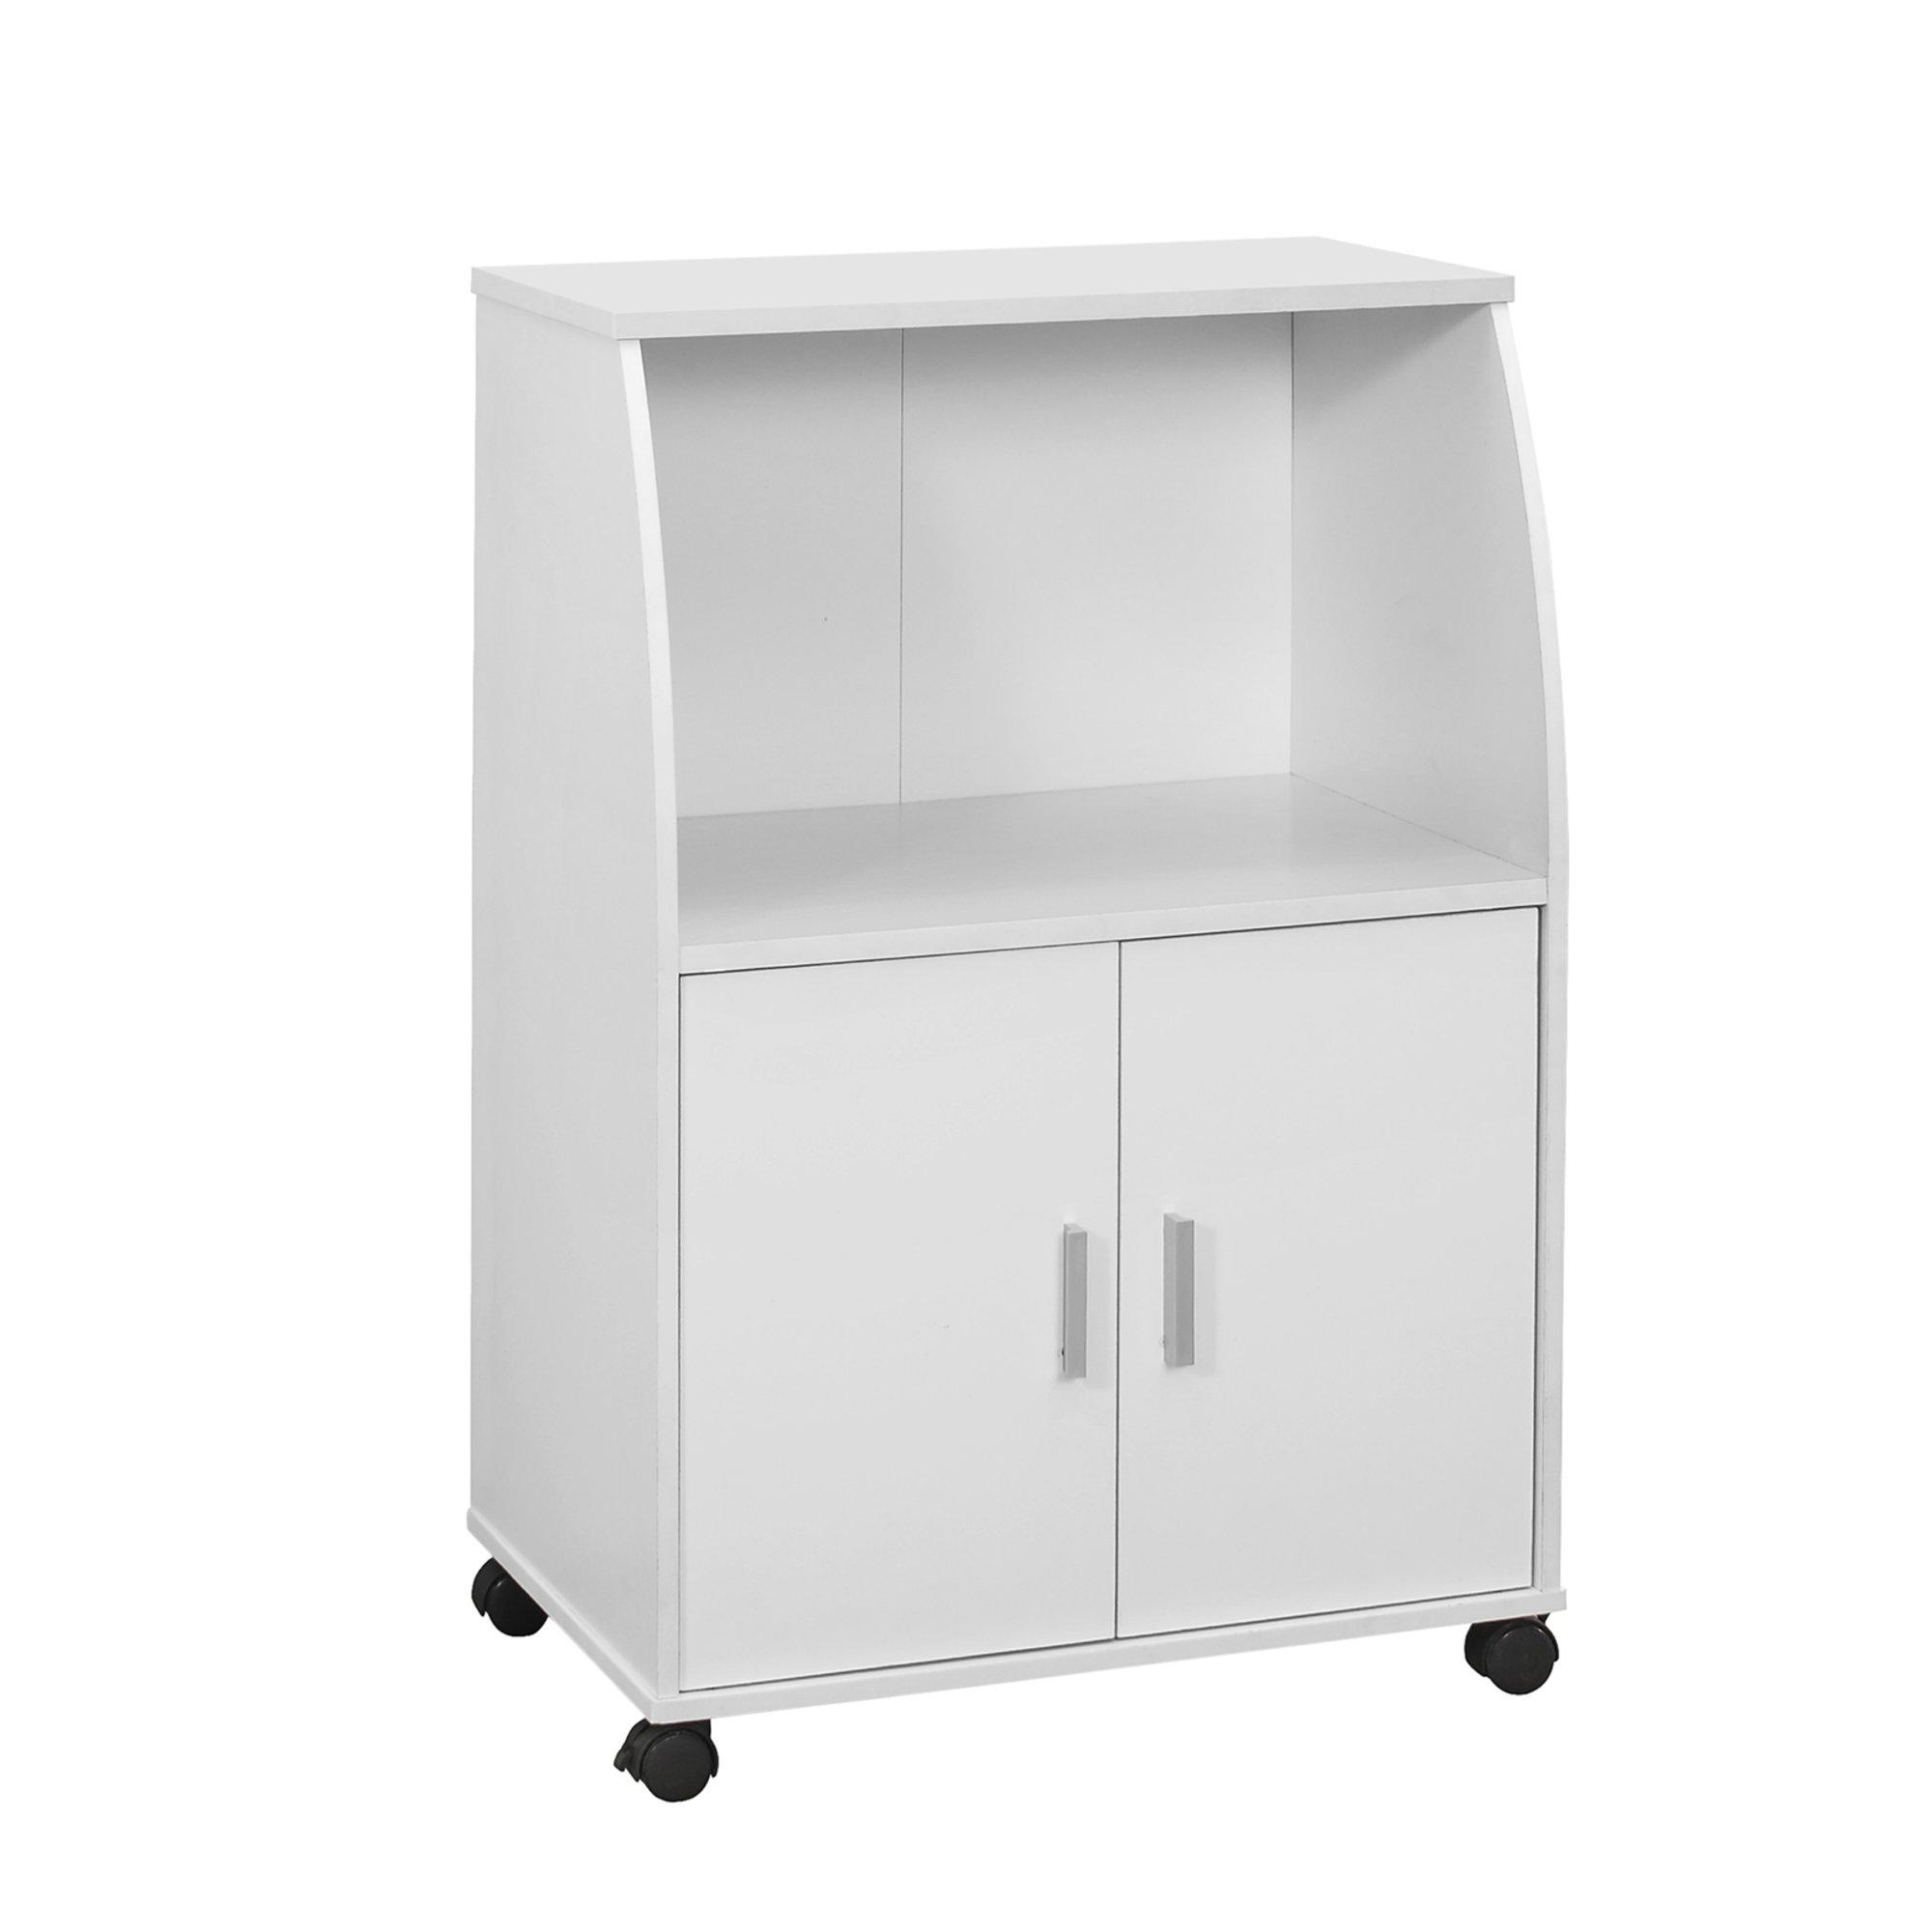 "15.25"" x 22"" x 33"" White Particle Board Laminate  Kitchen Cart"